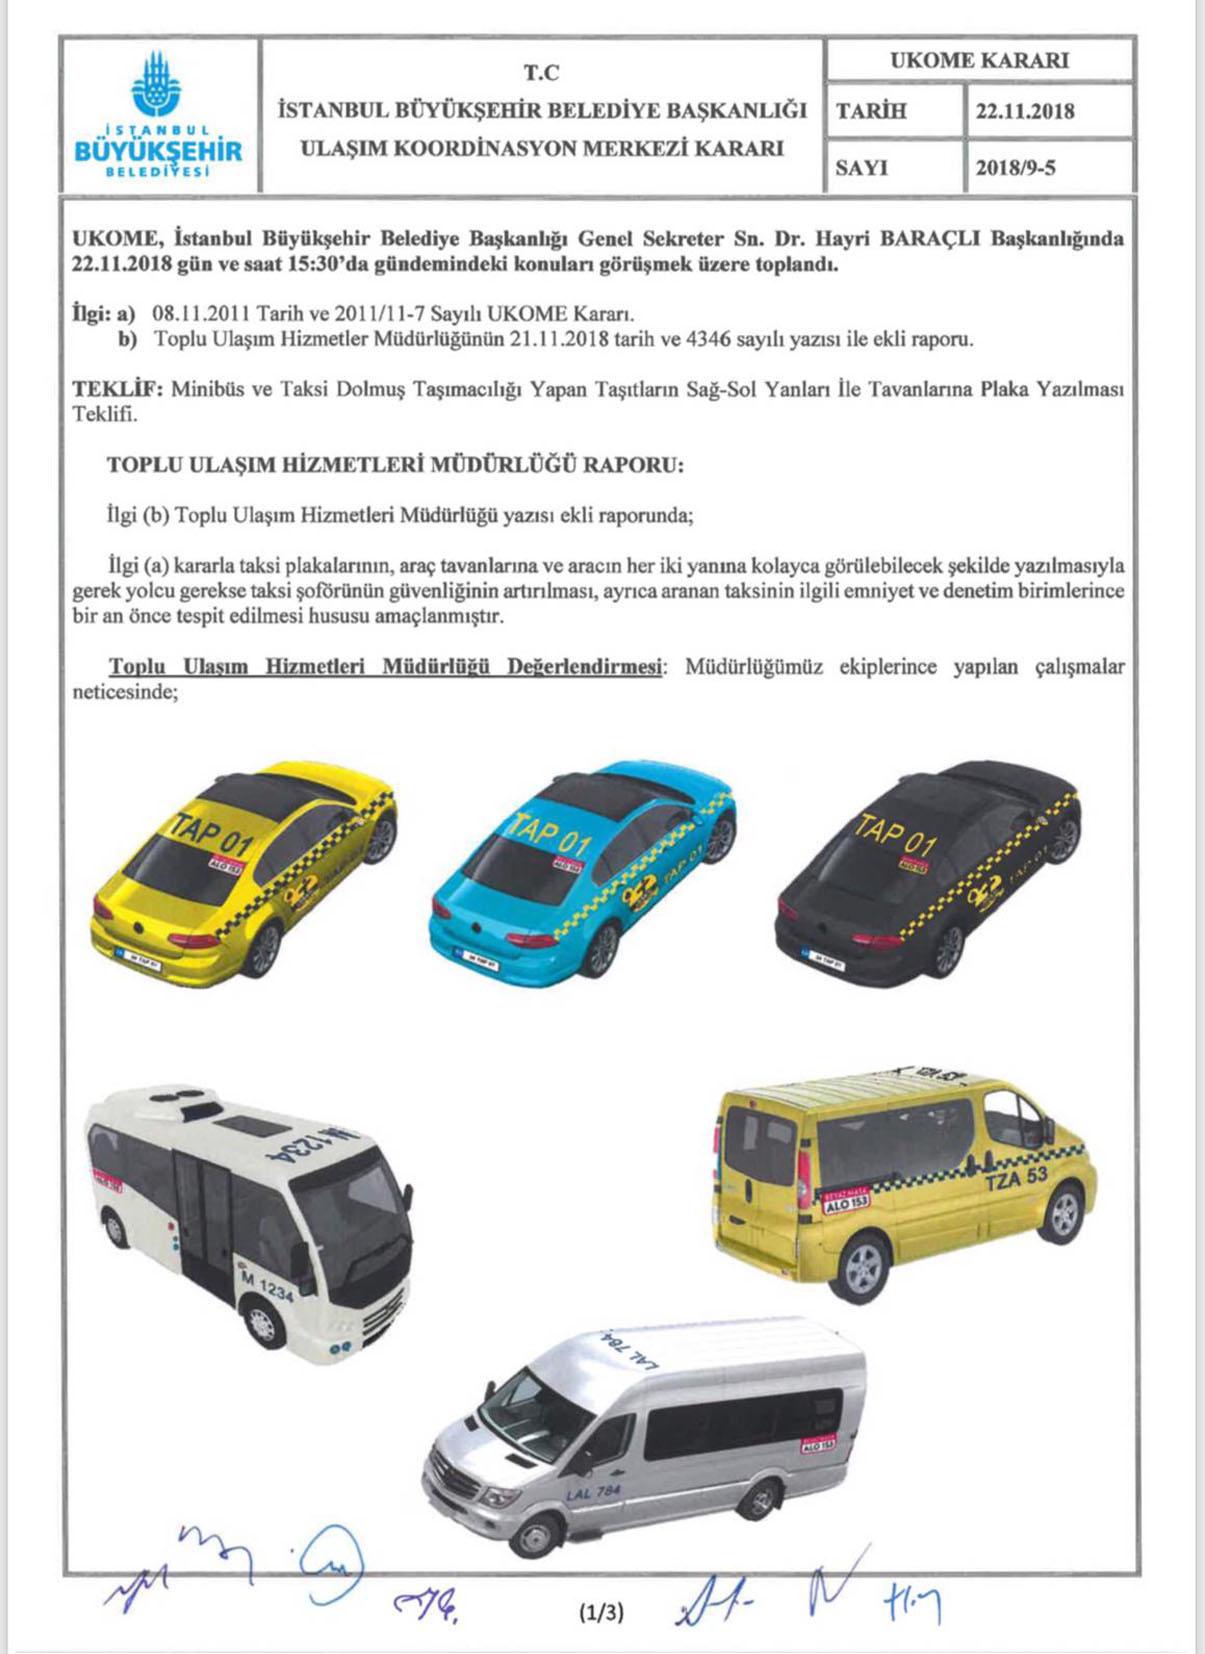 istanbul-Servis_Minibüs_ve_Dolmus_Plaka_Yazilari-UKOME-arac-YAZISI-KARARI-1